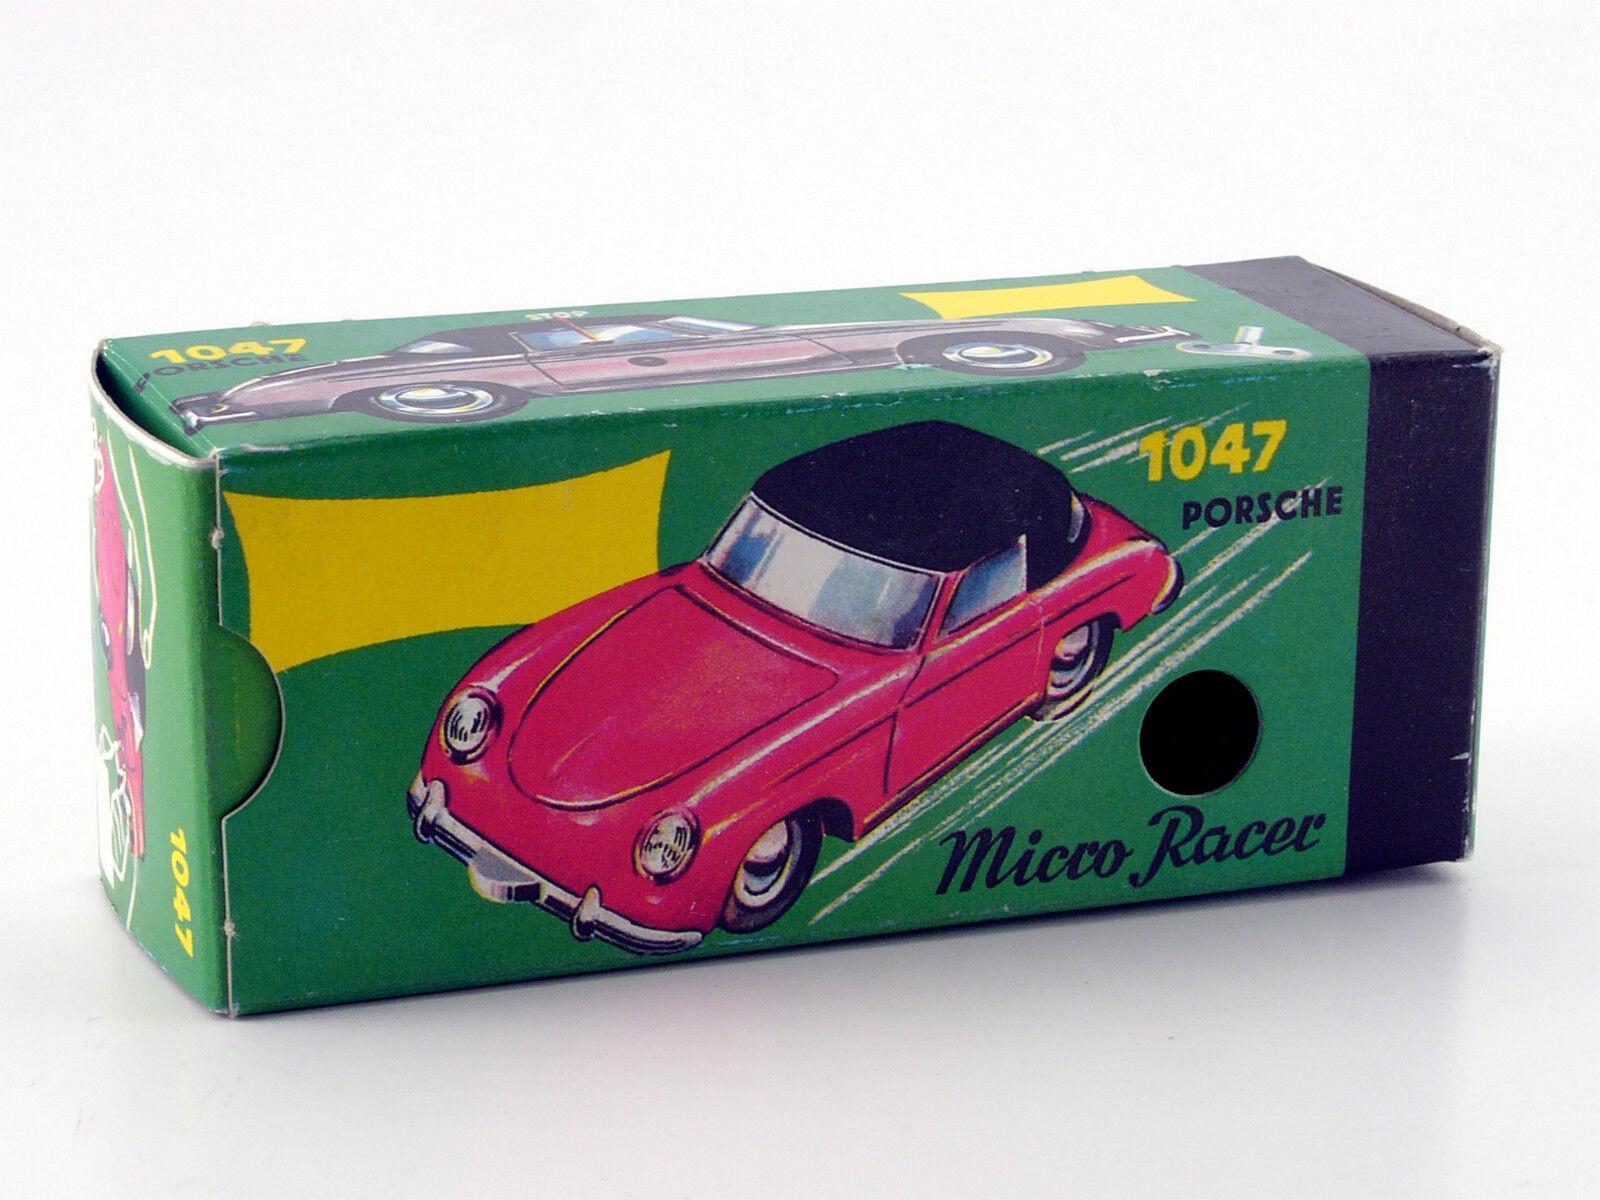 Lilliput Micro-Racer Micro-Racer Micro-Racer Porsche 356 gold-black b95013